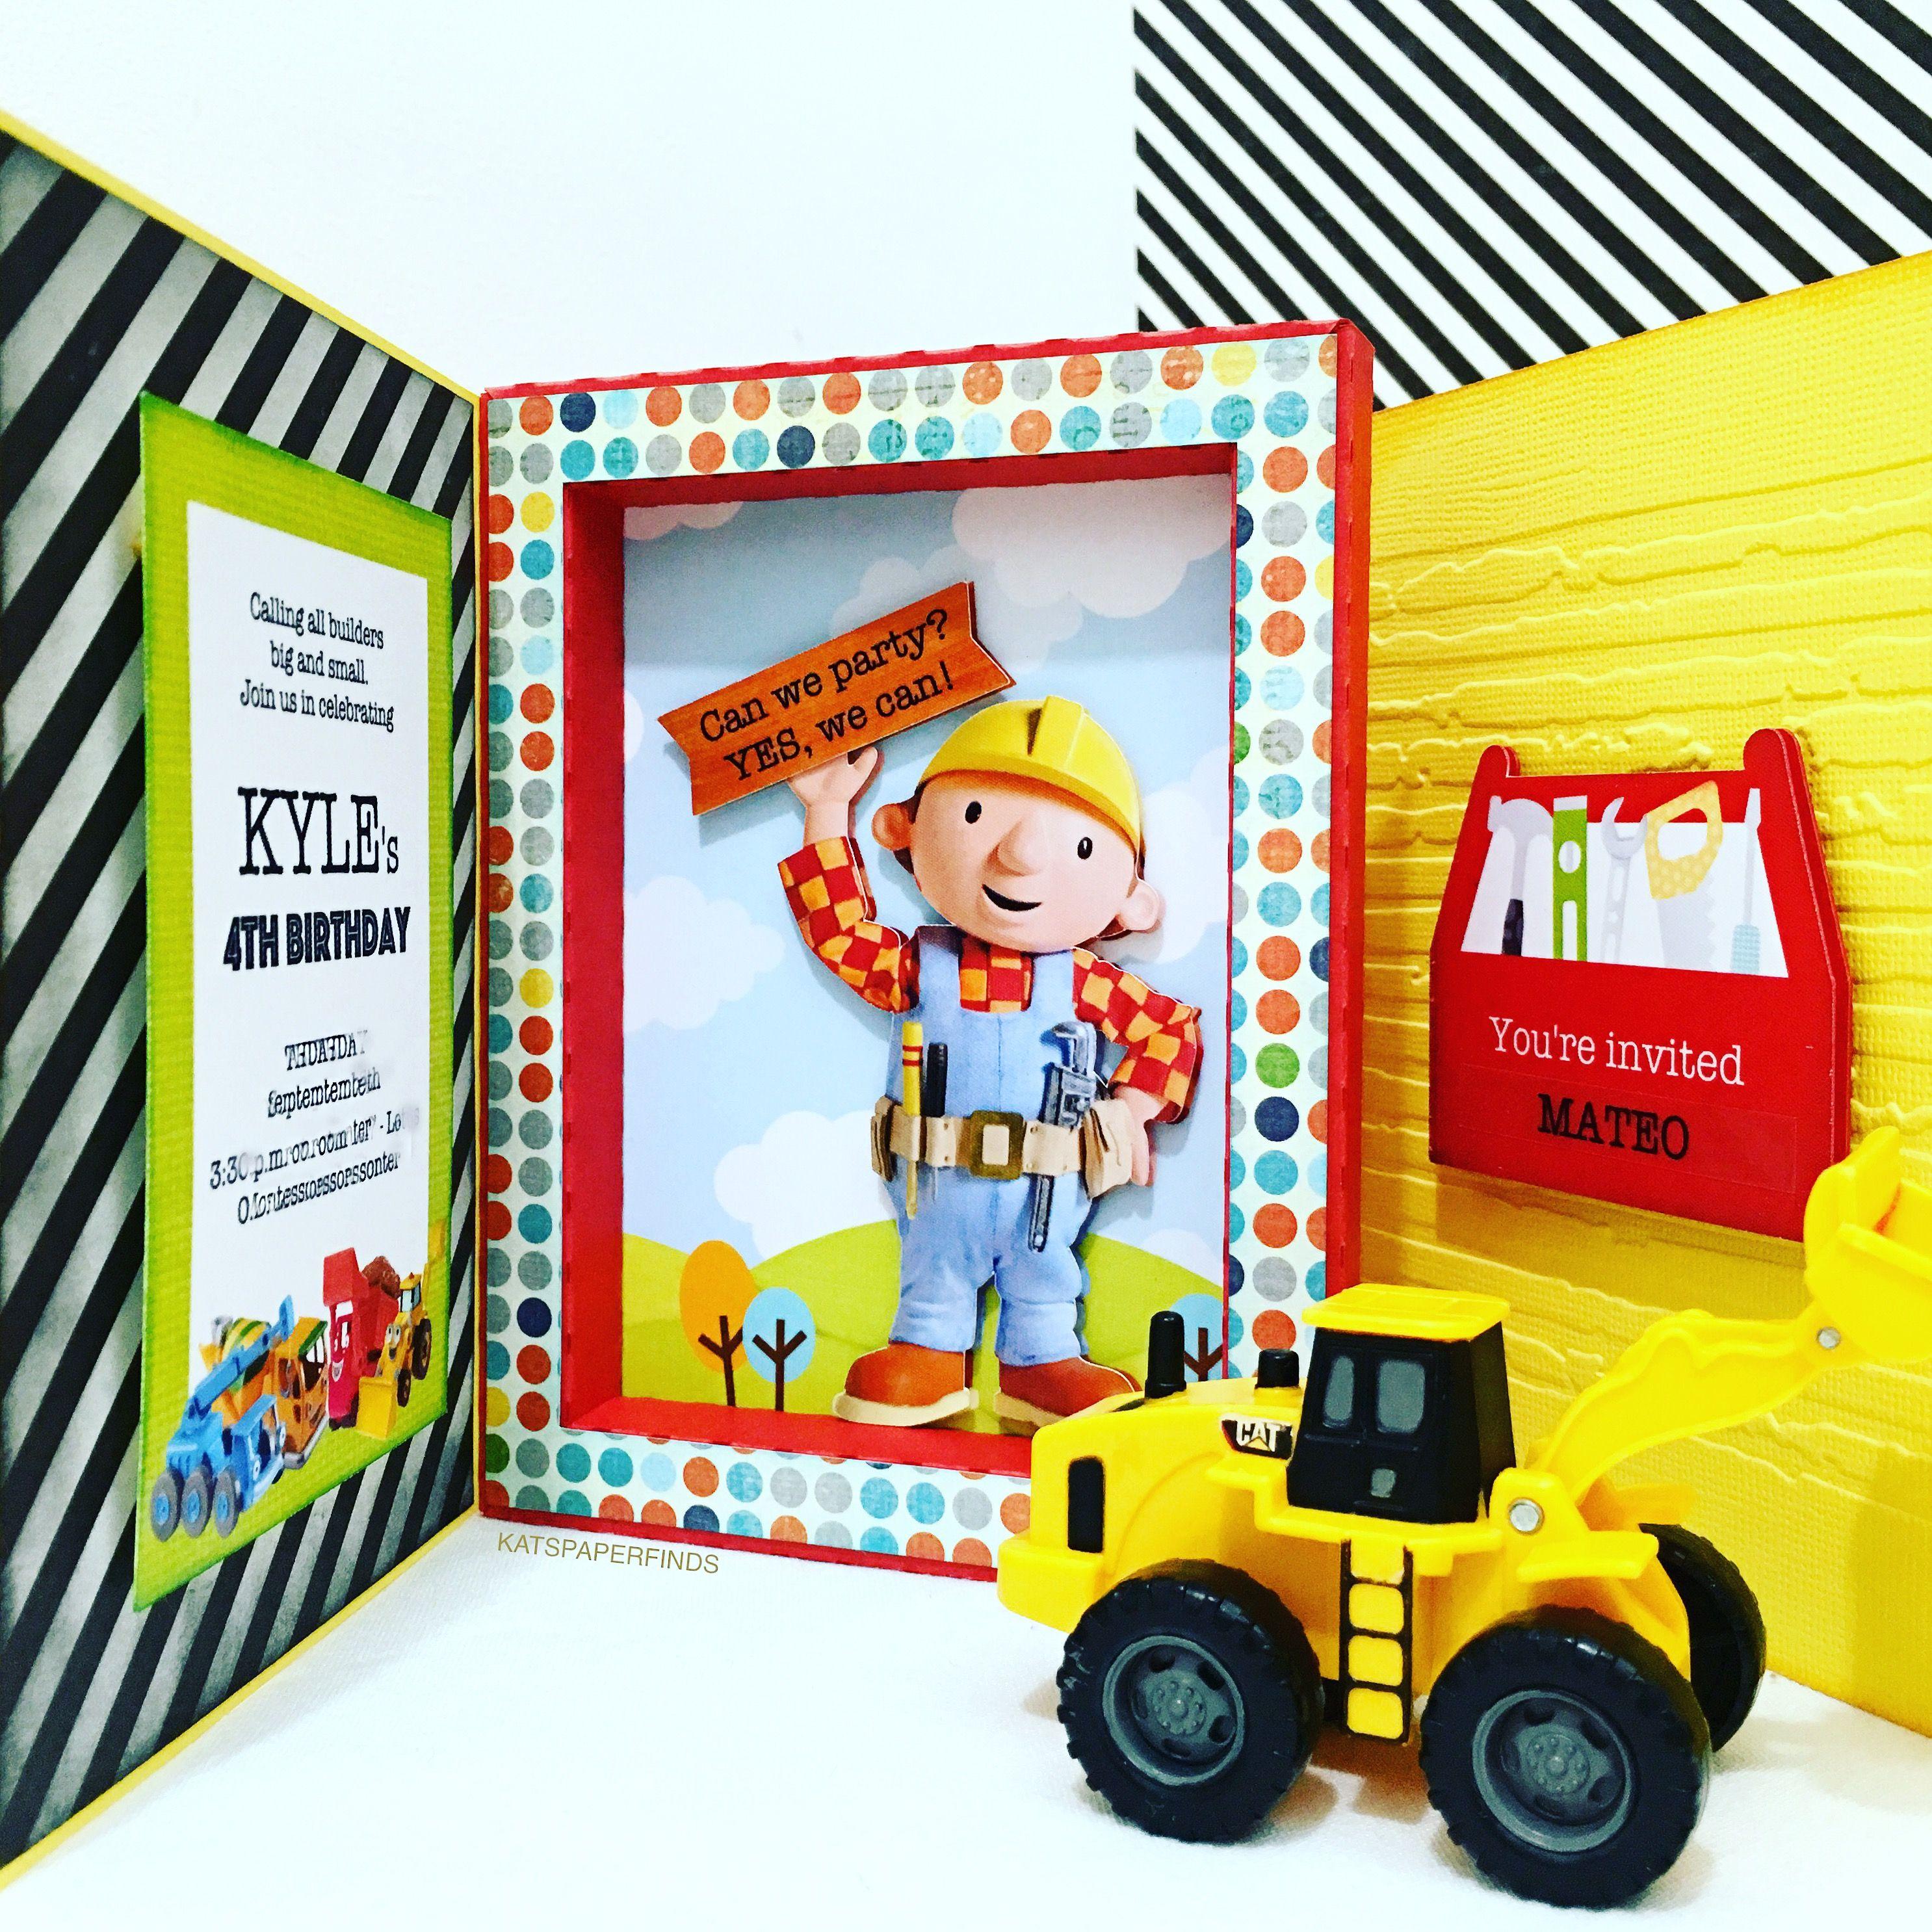 Bob The Builder Frame Card Invitation For Kyle S 4th Birthday Frame Card Invitations 4th Birthday